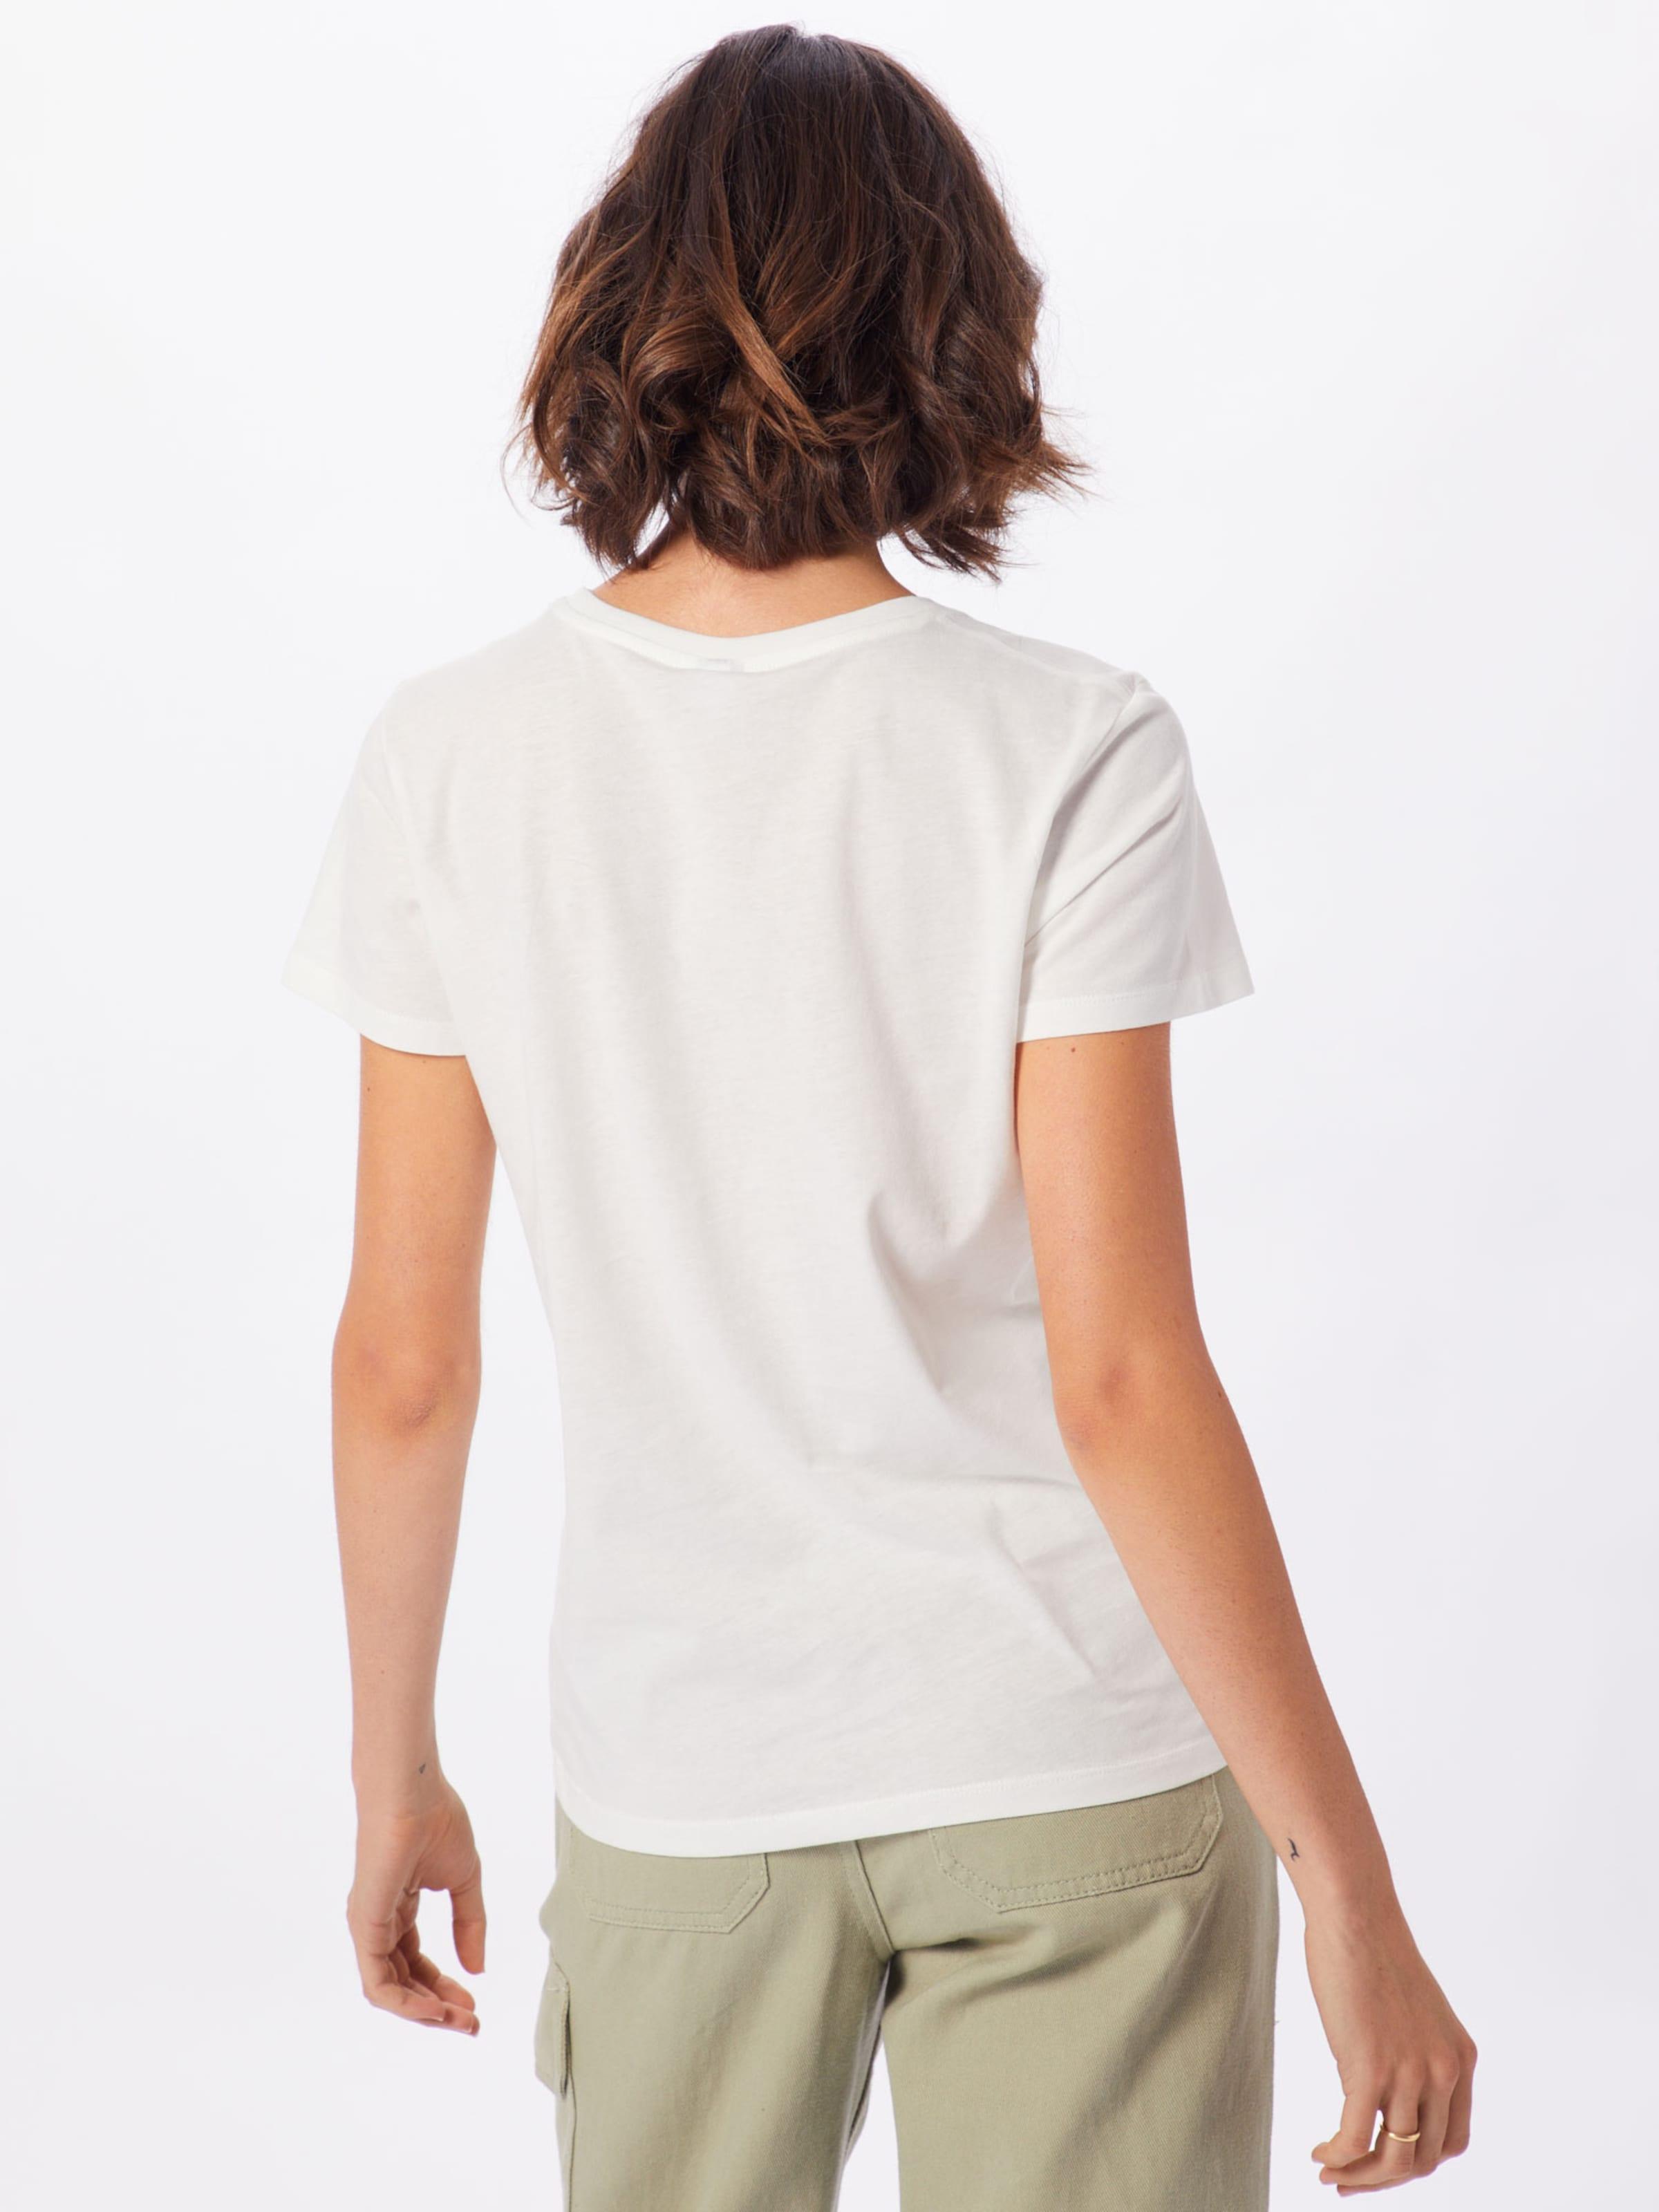 Blanc Cassé Iriedaily En shirt CognacNoir Flag' 'blotchy T OkTXuPiZ